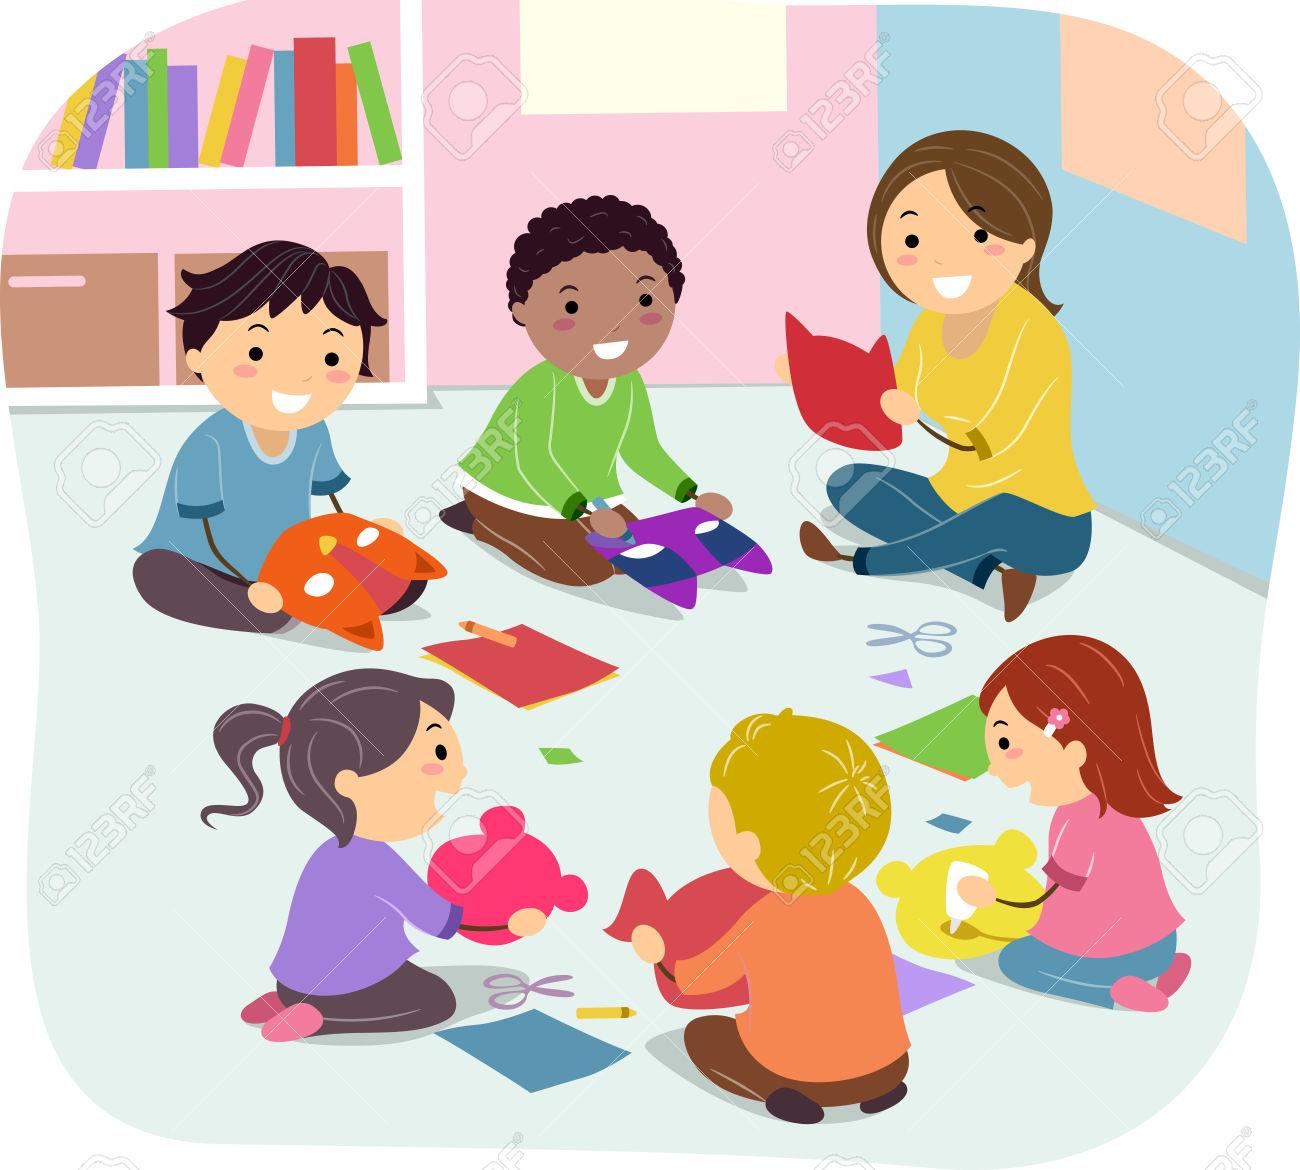 Stickman Illustration Of Kids Making Masks In Art Class Stock.